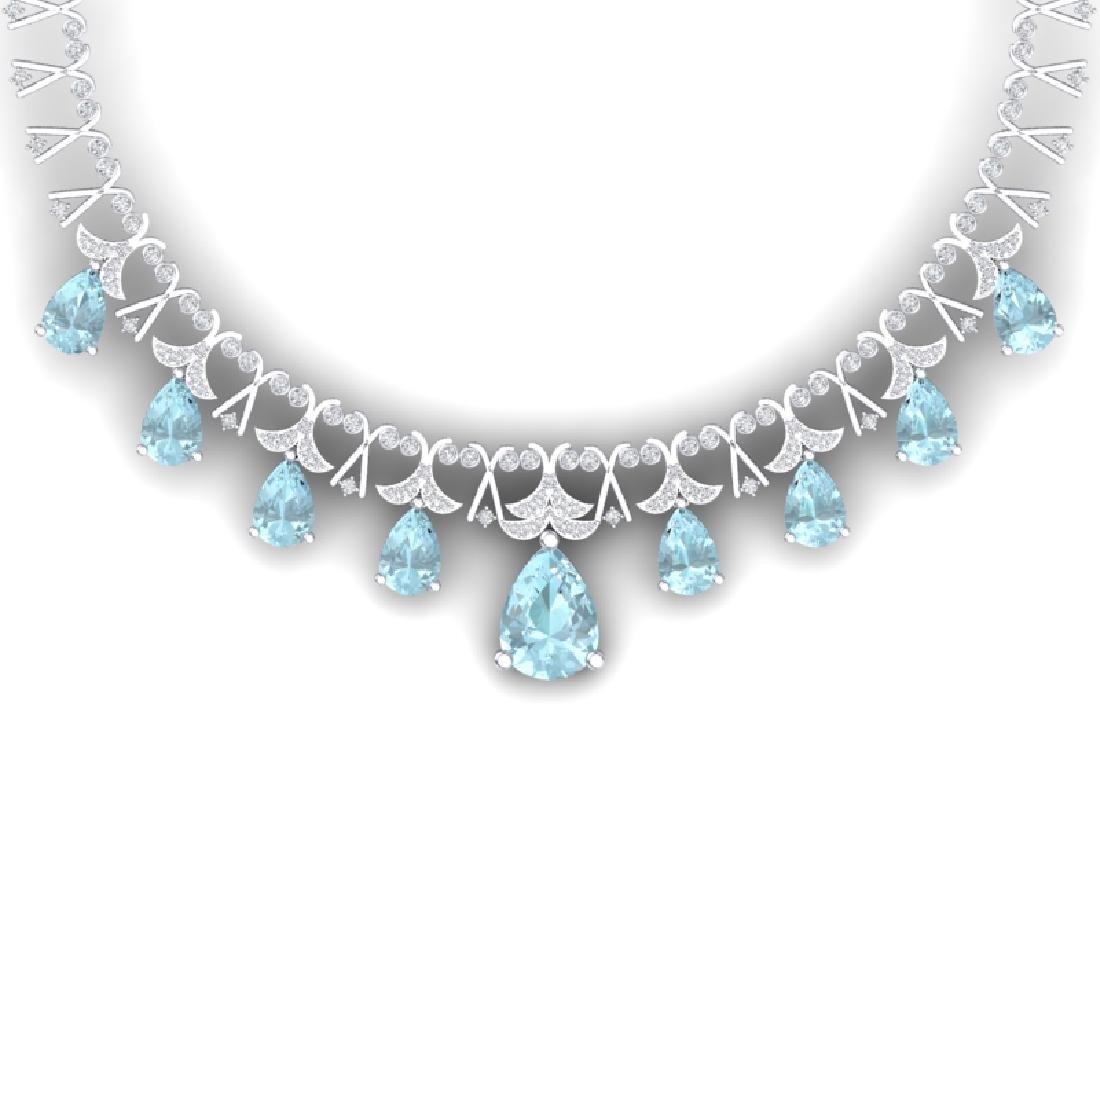 60.62 CTW Royalty Sky Topaz & VS Diamond Necklace 18K